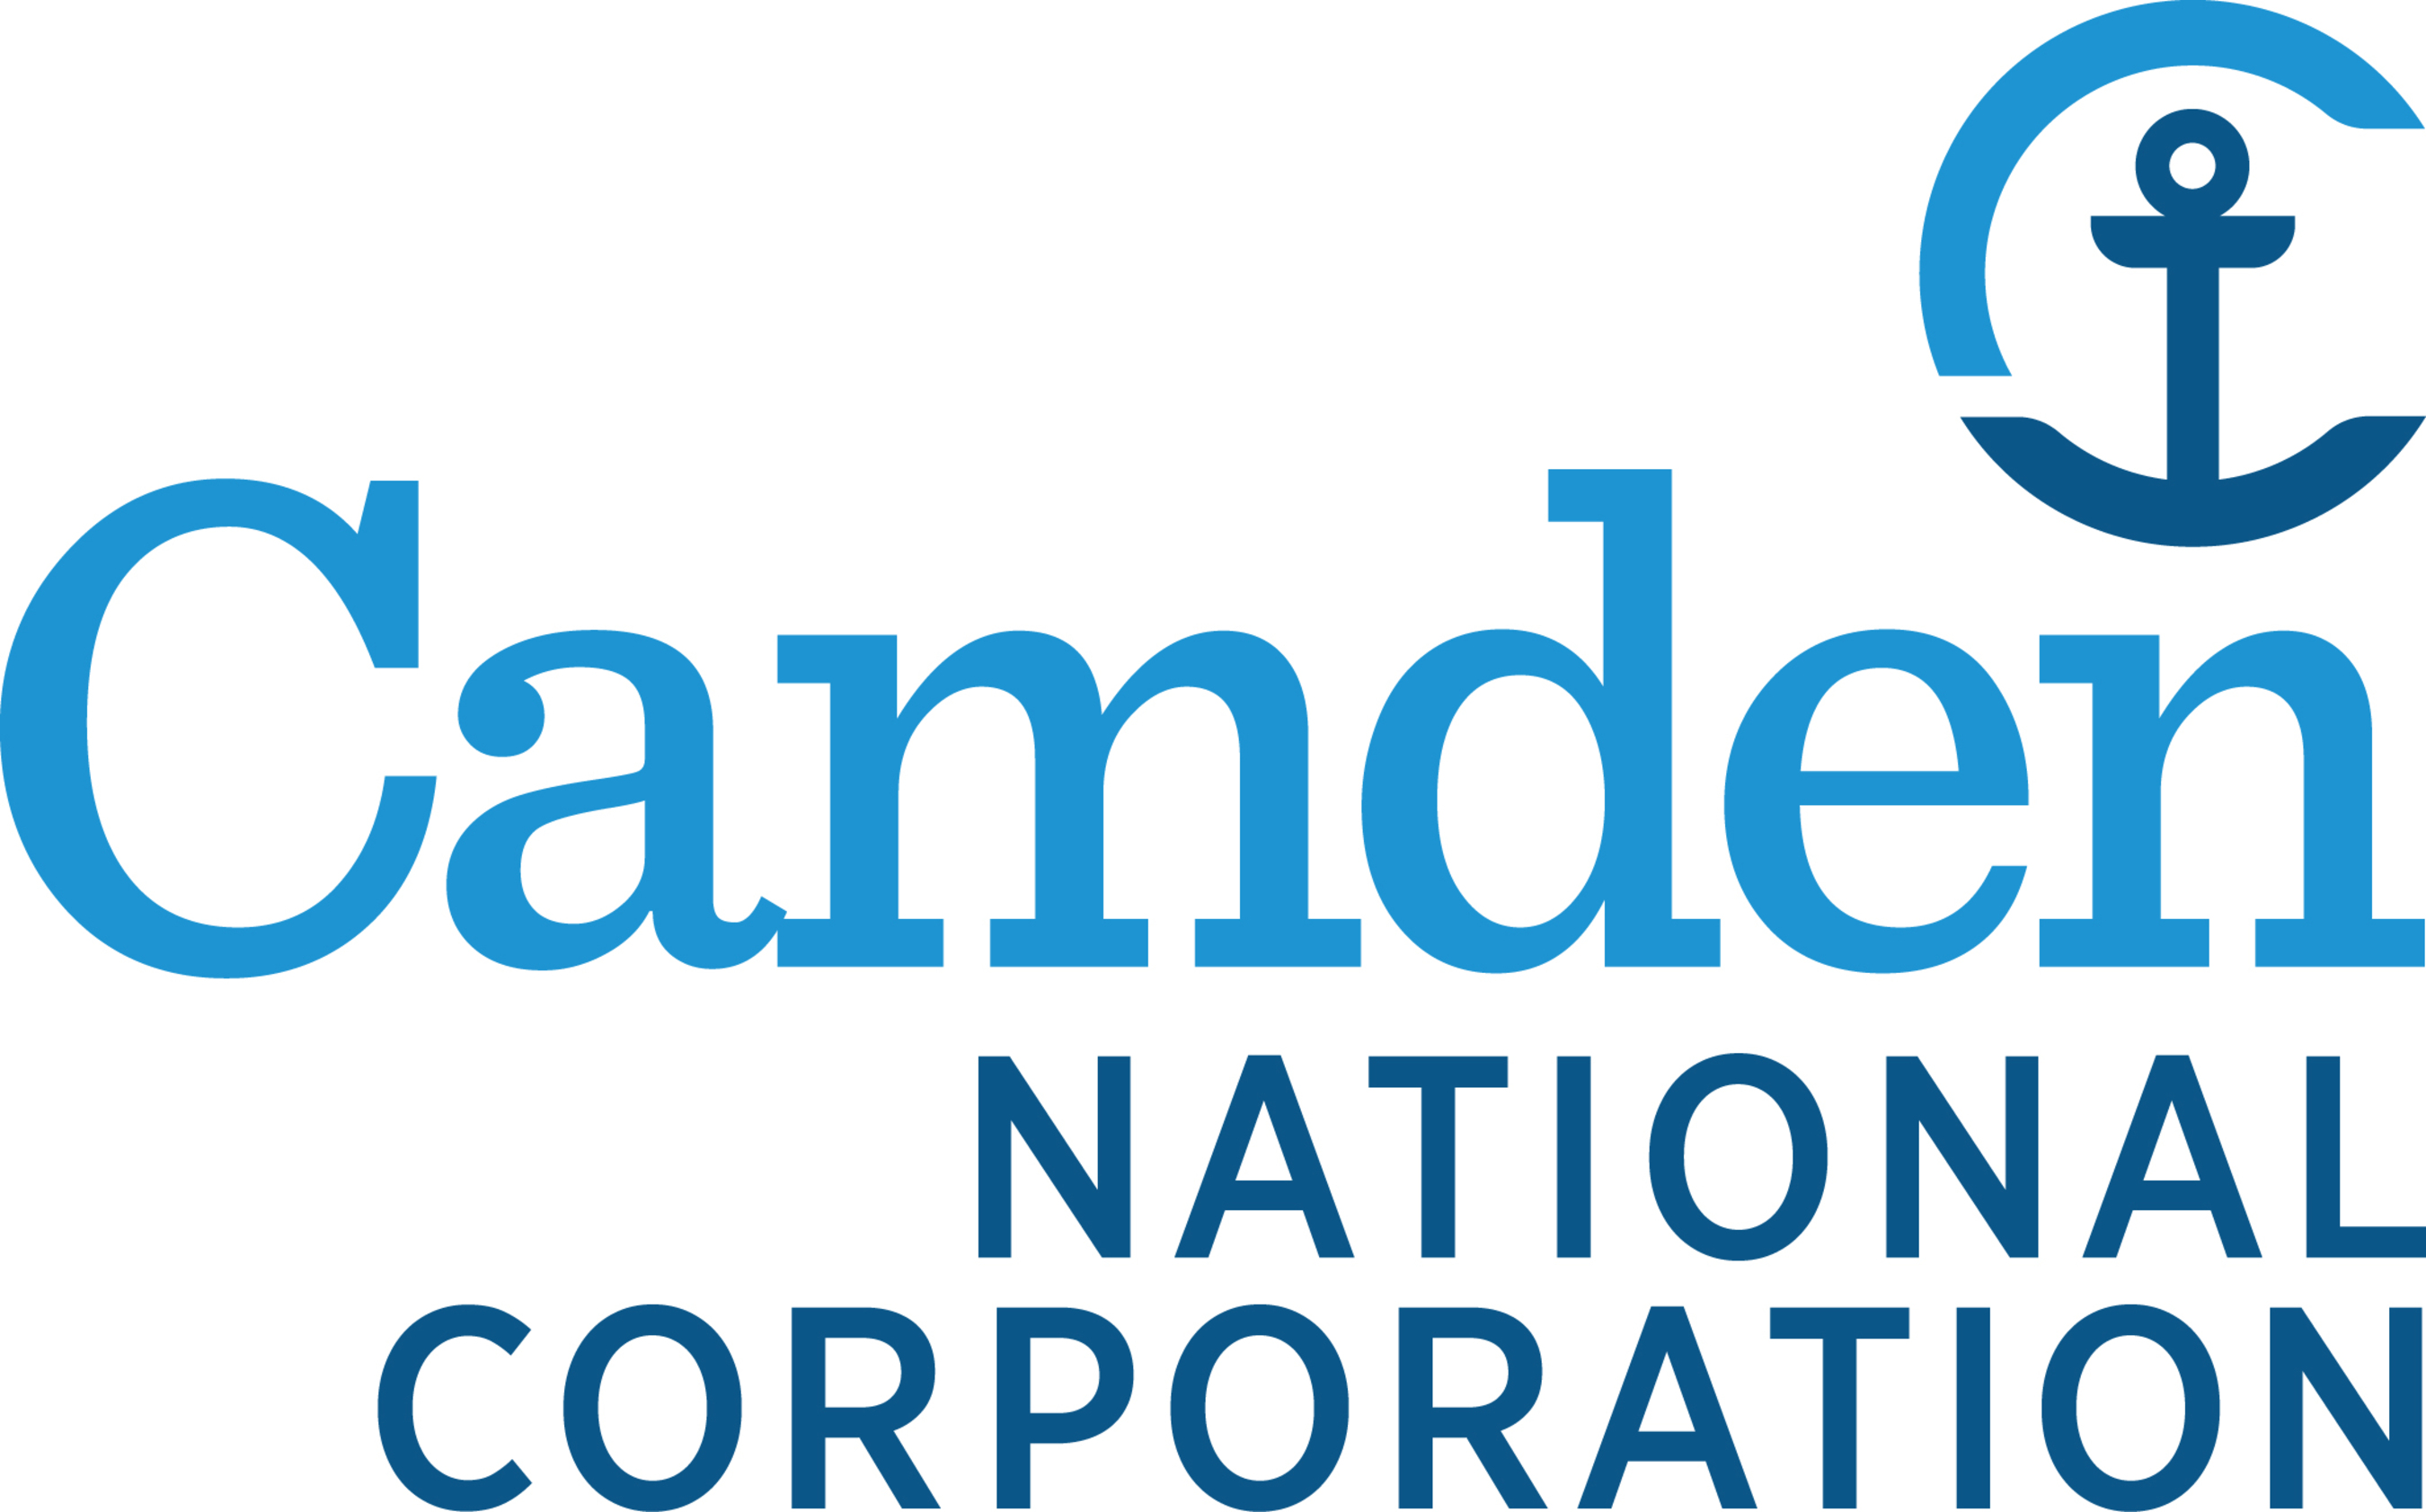 www.camdennational.com.